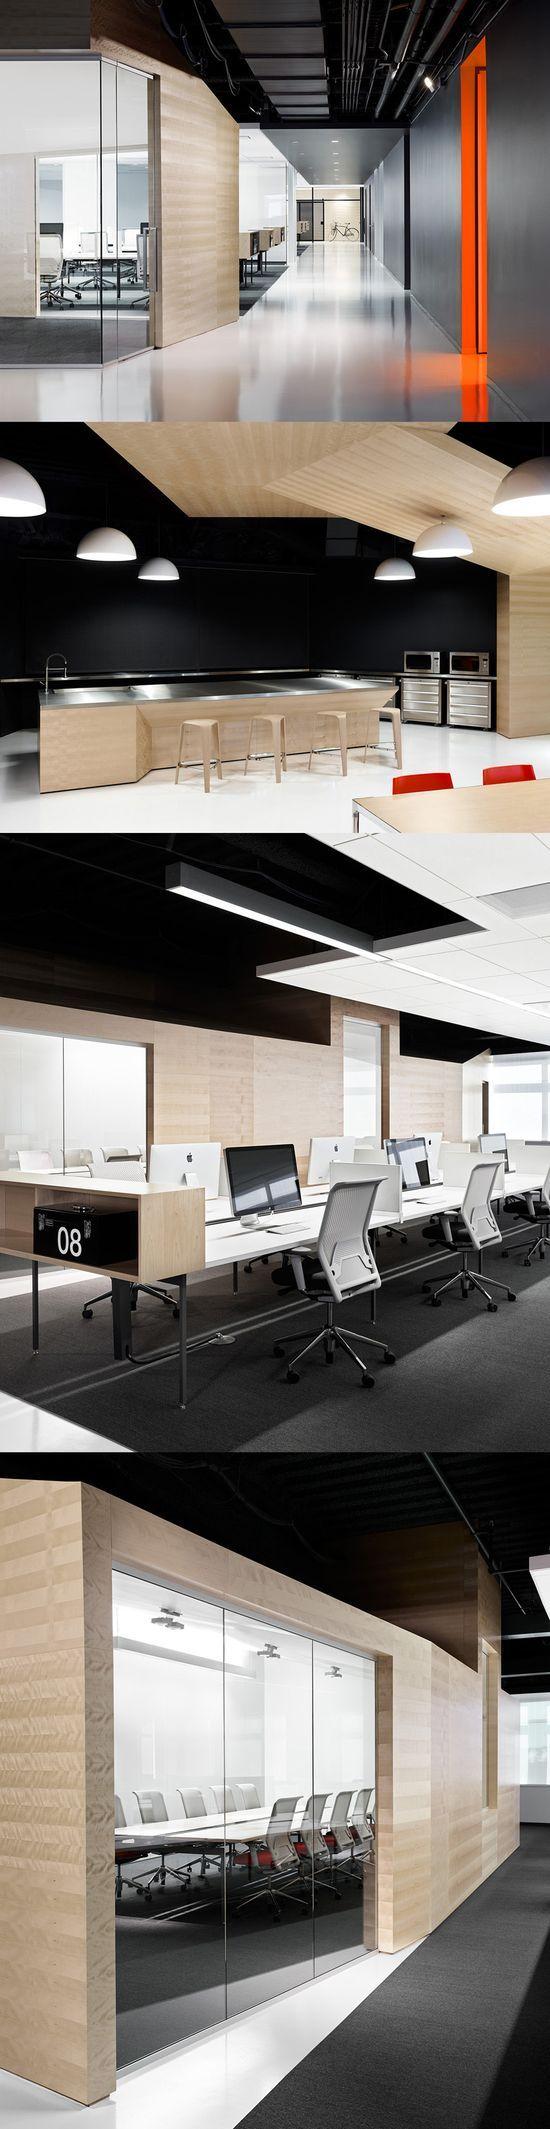 Architecture: Techshed_home improvement marketplace company_Foster City_California_Designed by Garcia Tamjidi Architecture Design